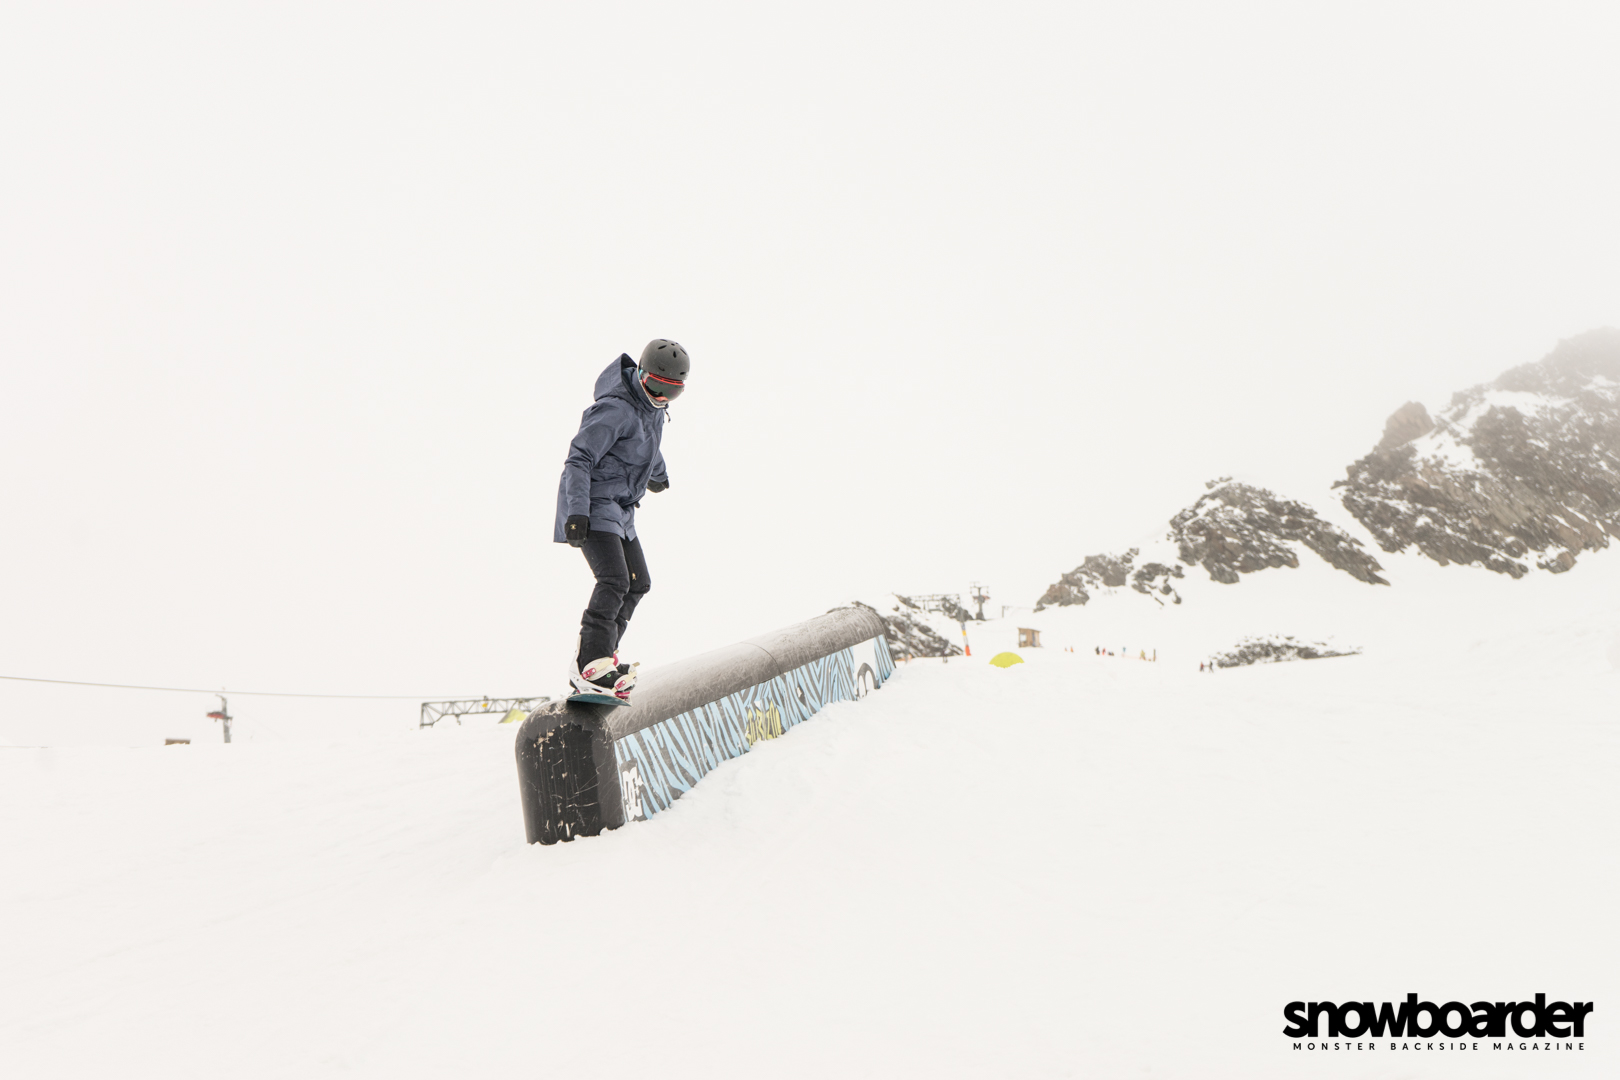 snowboardermbm-21